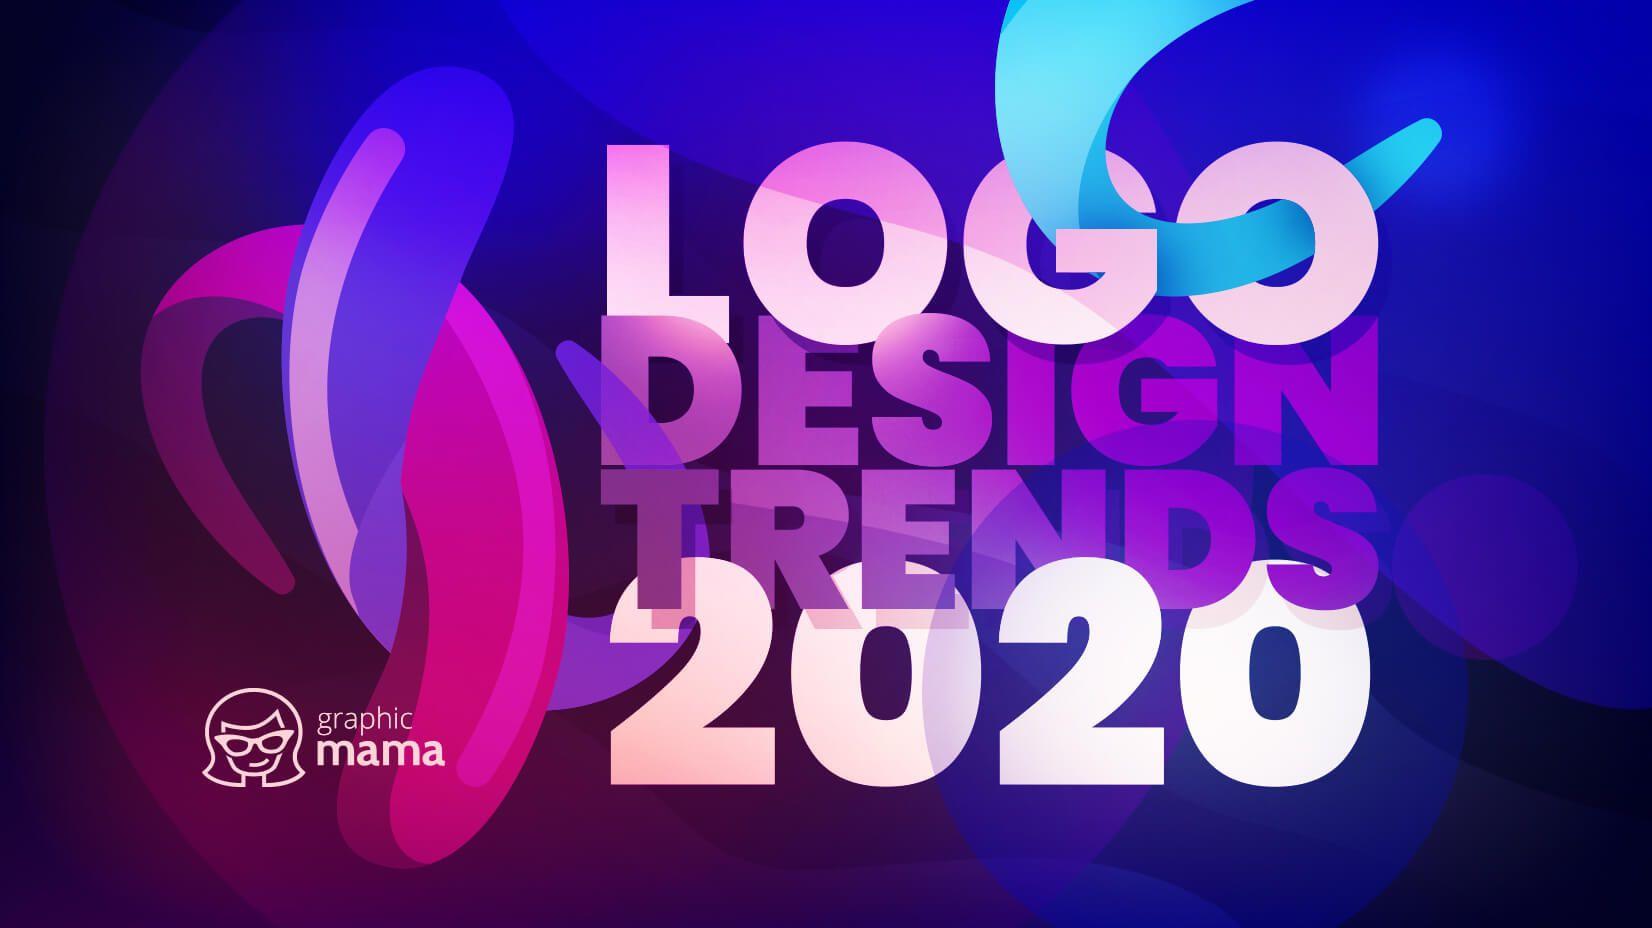 Top graphic design trends in 2020 ...